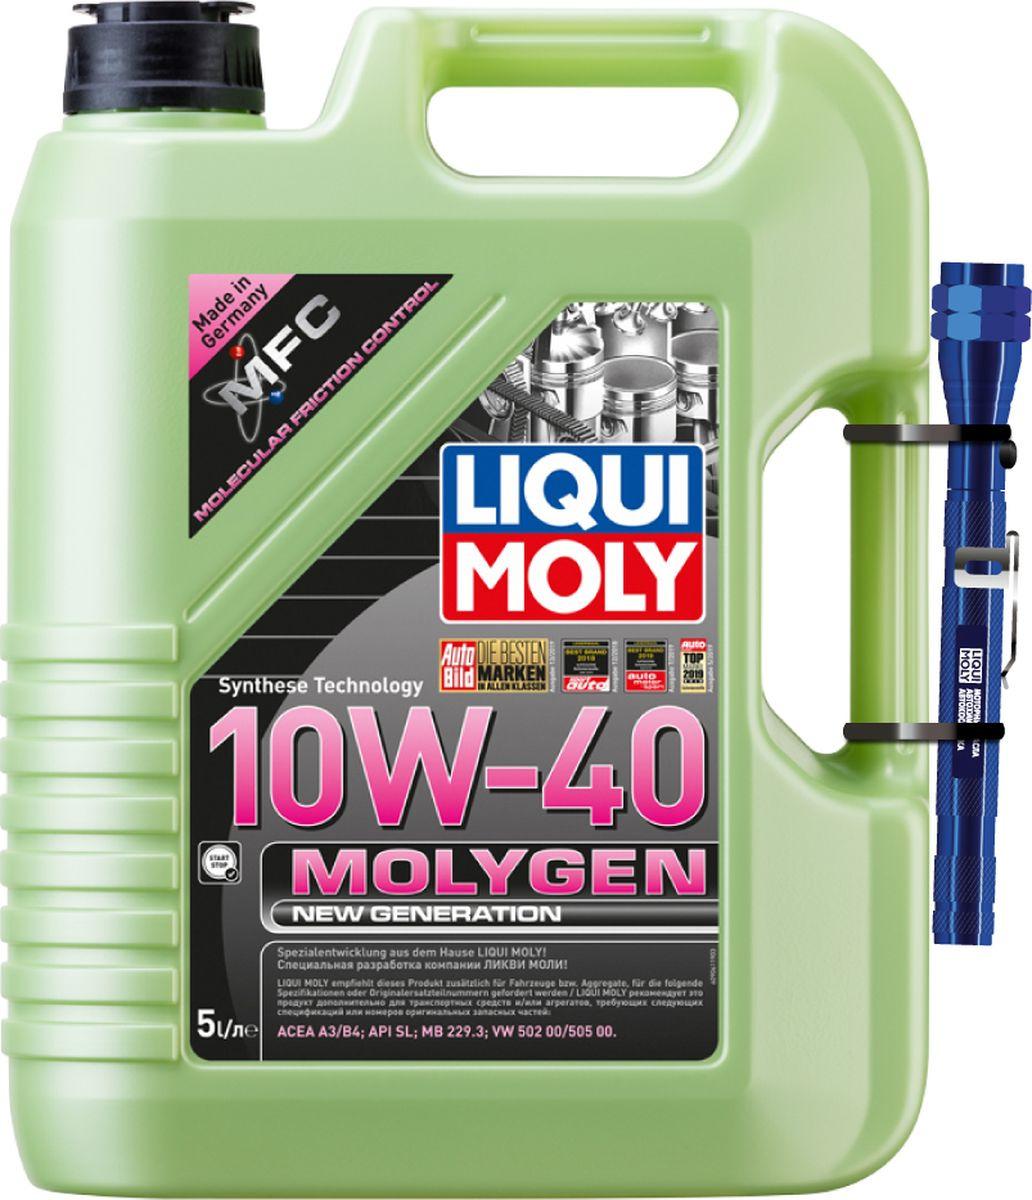 Моторное масло Liqui Moly Molygen New Generation, НС-синтетическое, 10W-40, 5 л + Фонарик в подарок 9042d liquimoly нс синт мот масло molygen new generation 5w 30 4л фонарик арт 7520r